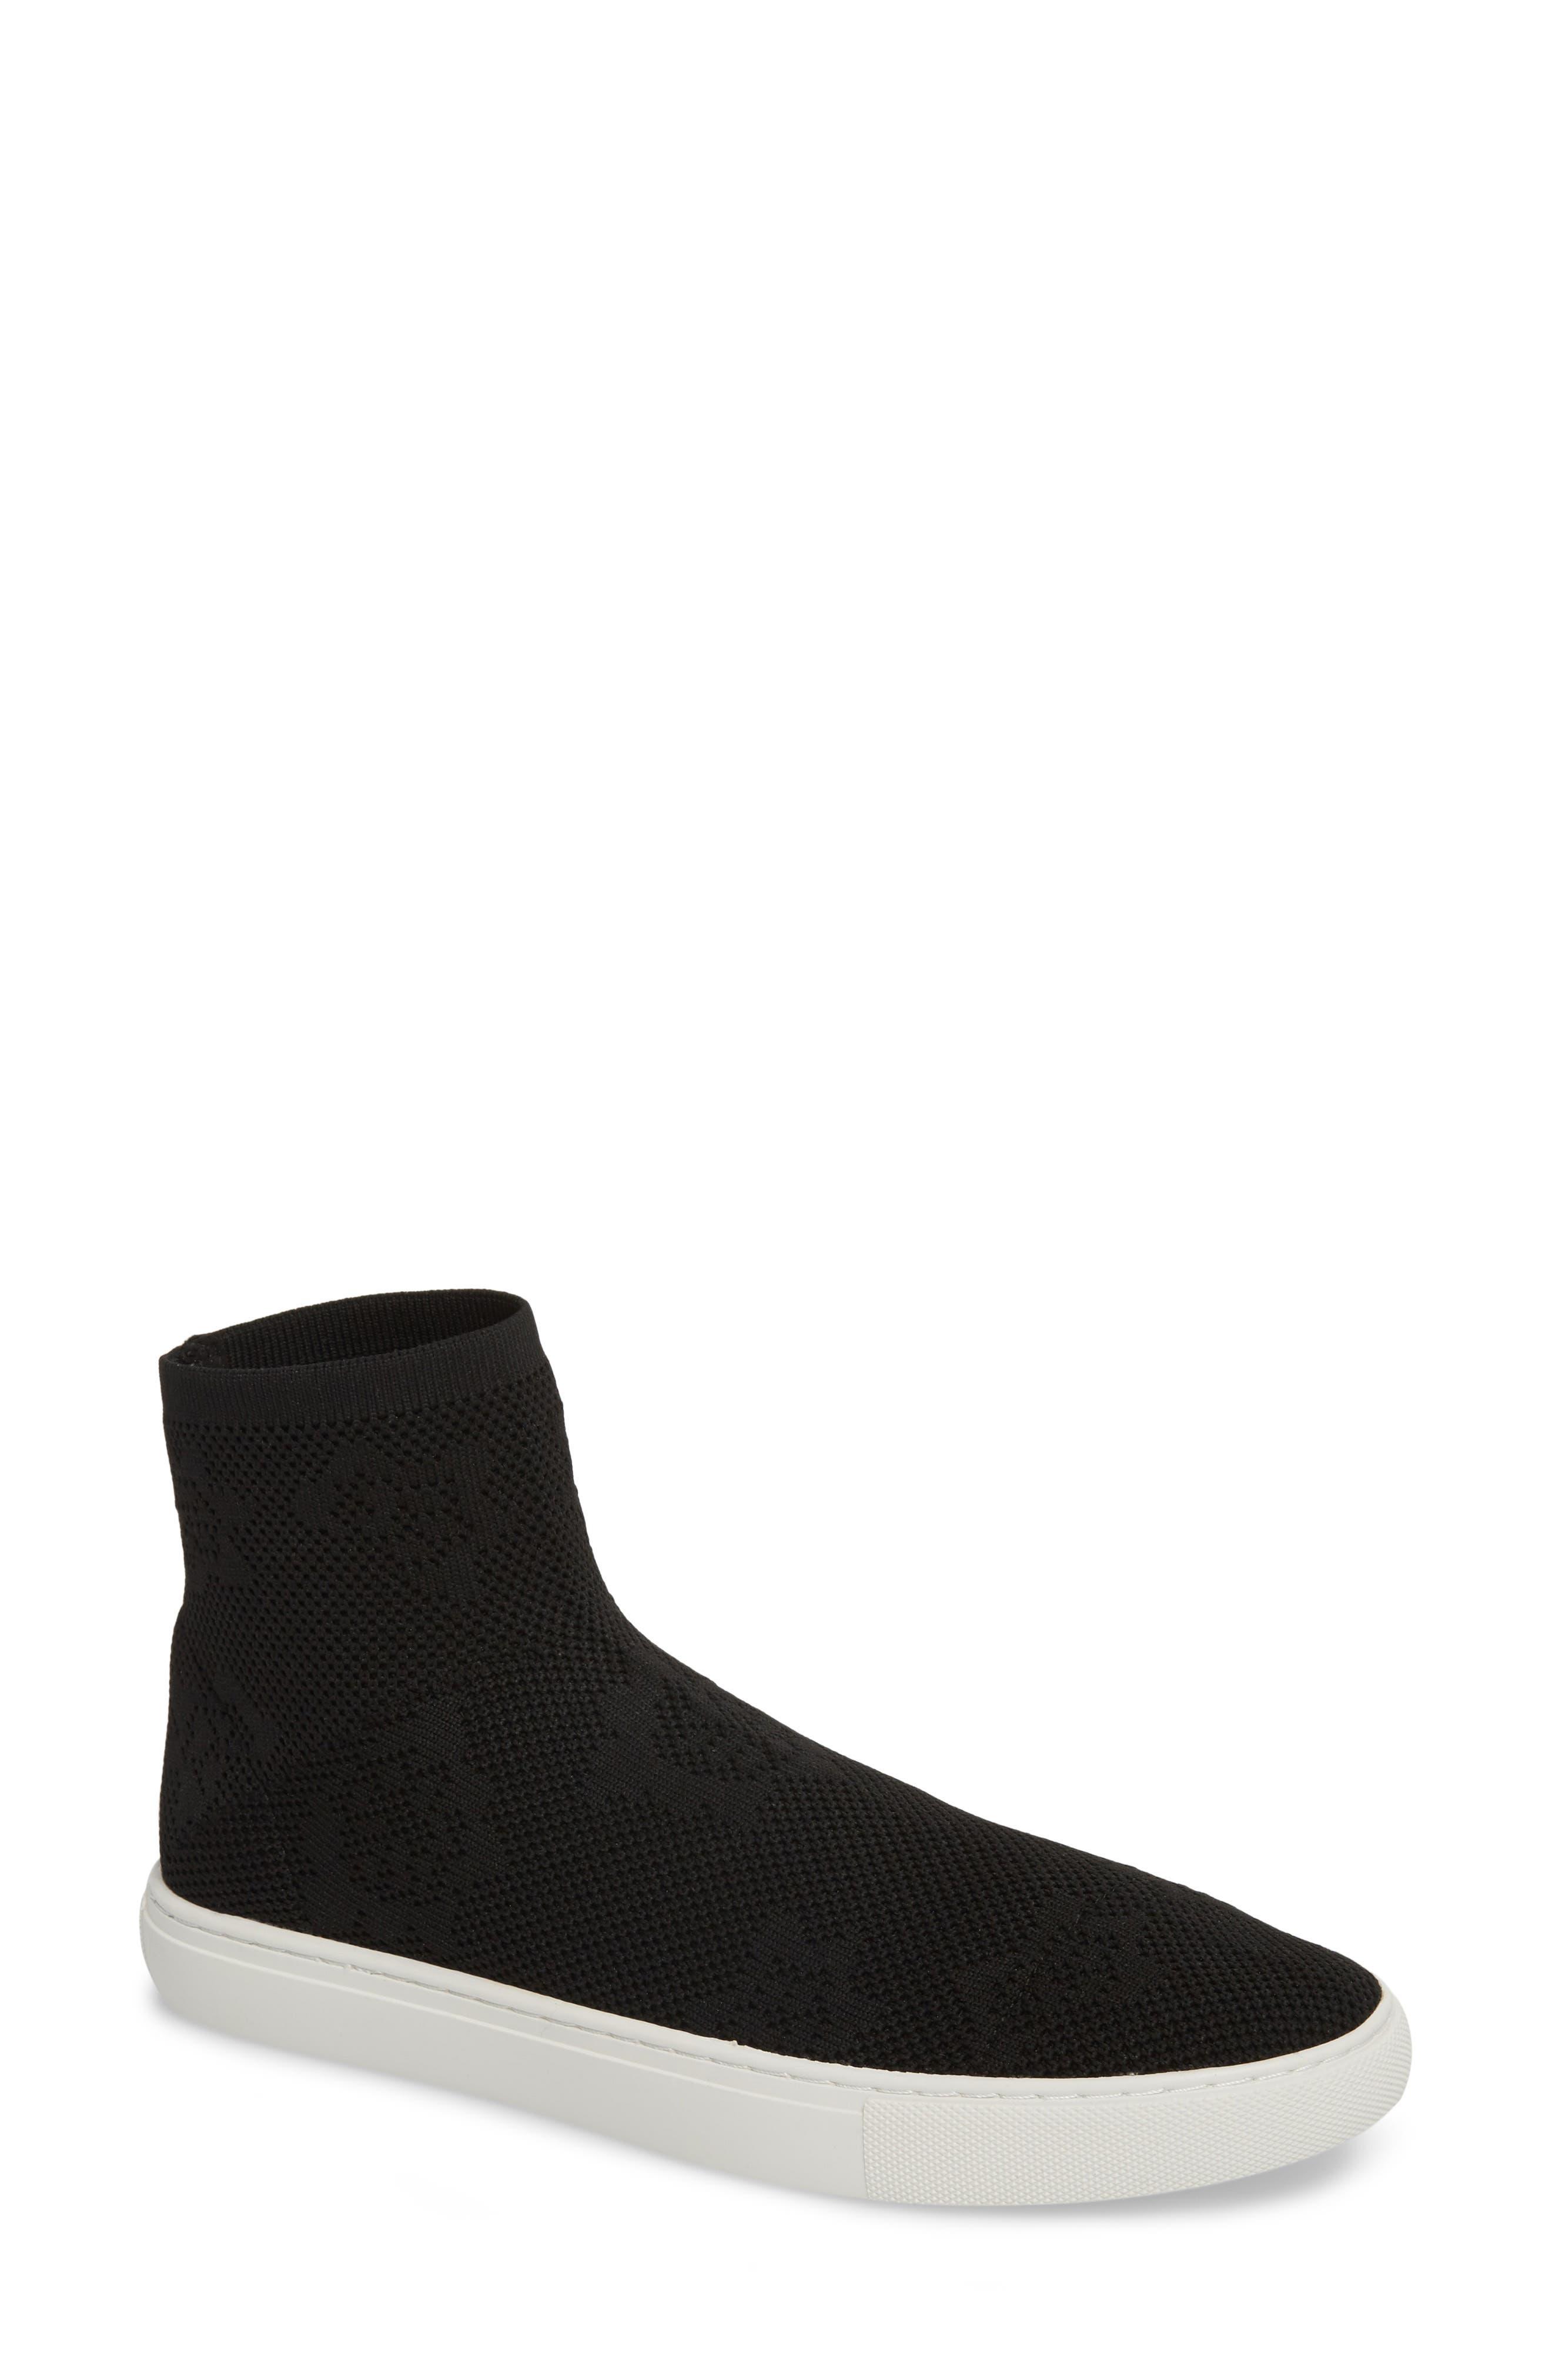 Keating Sneaker,                             Main thumbnail 1, color,